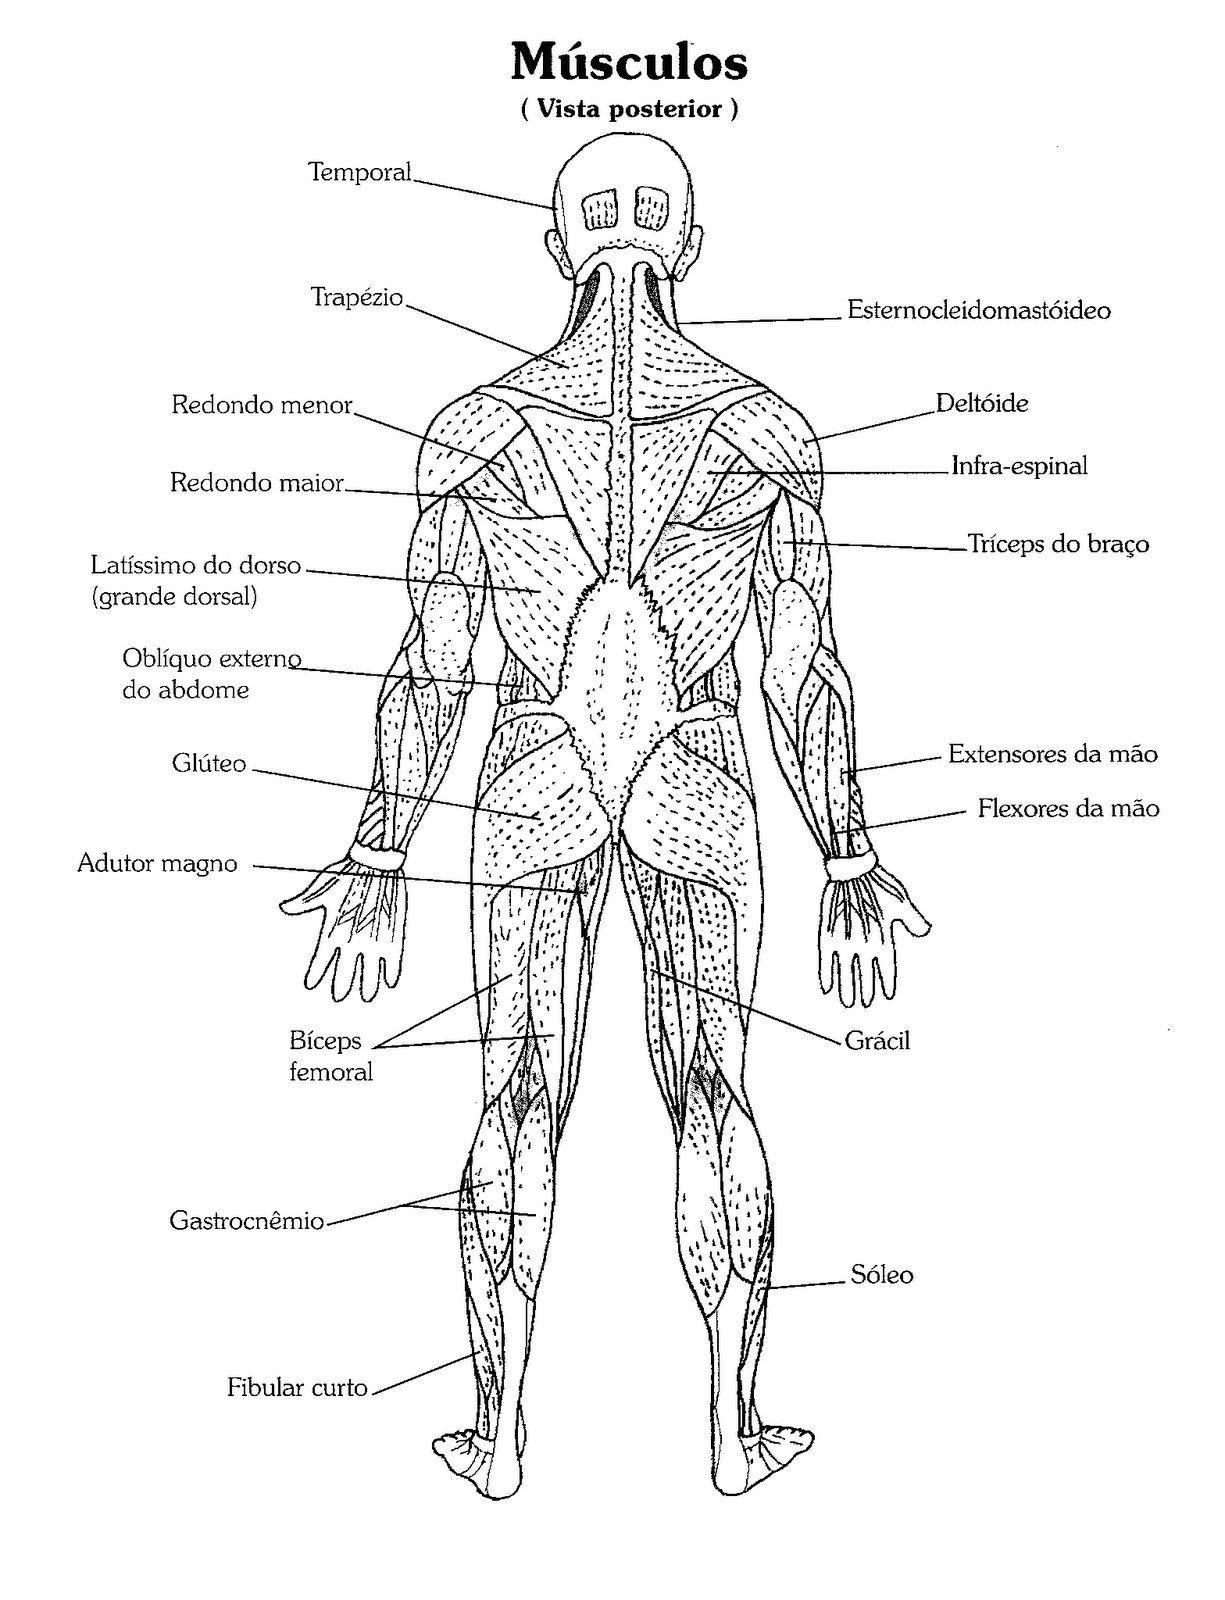 Alguns Musculos Na Visao Posterior Relembrando Nomes E Colorindo